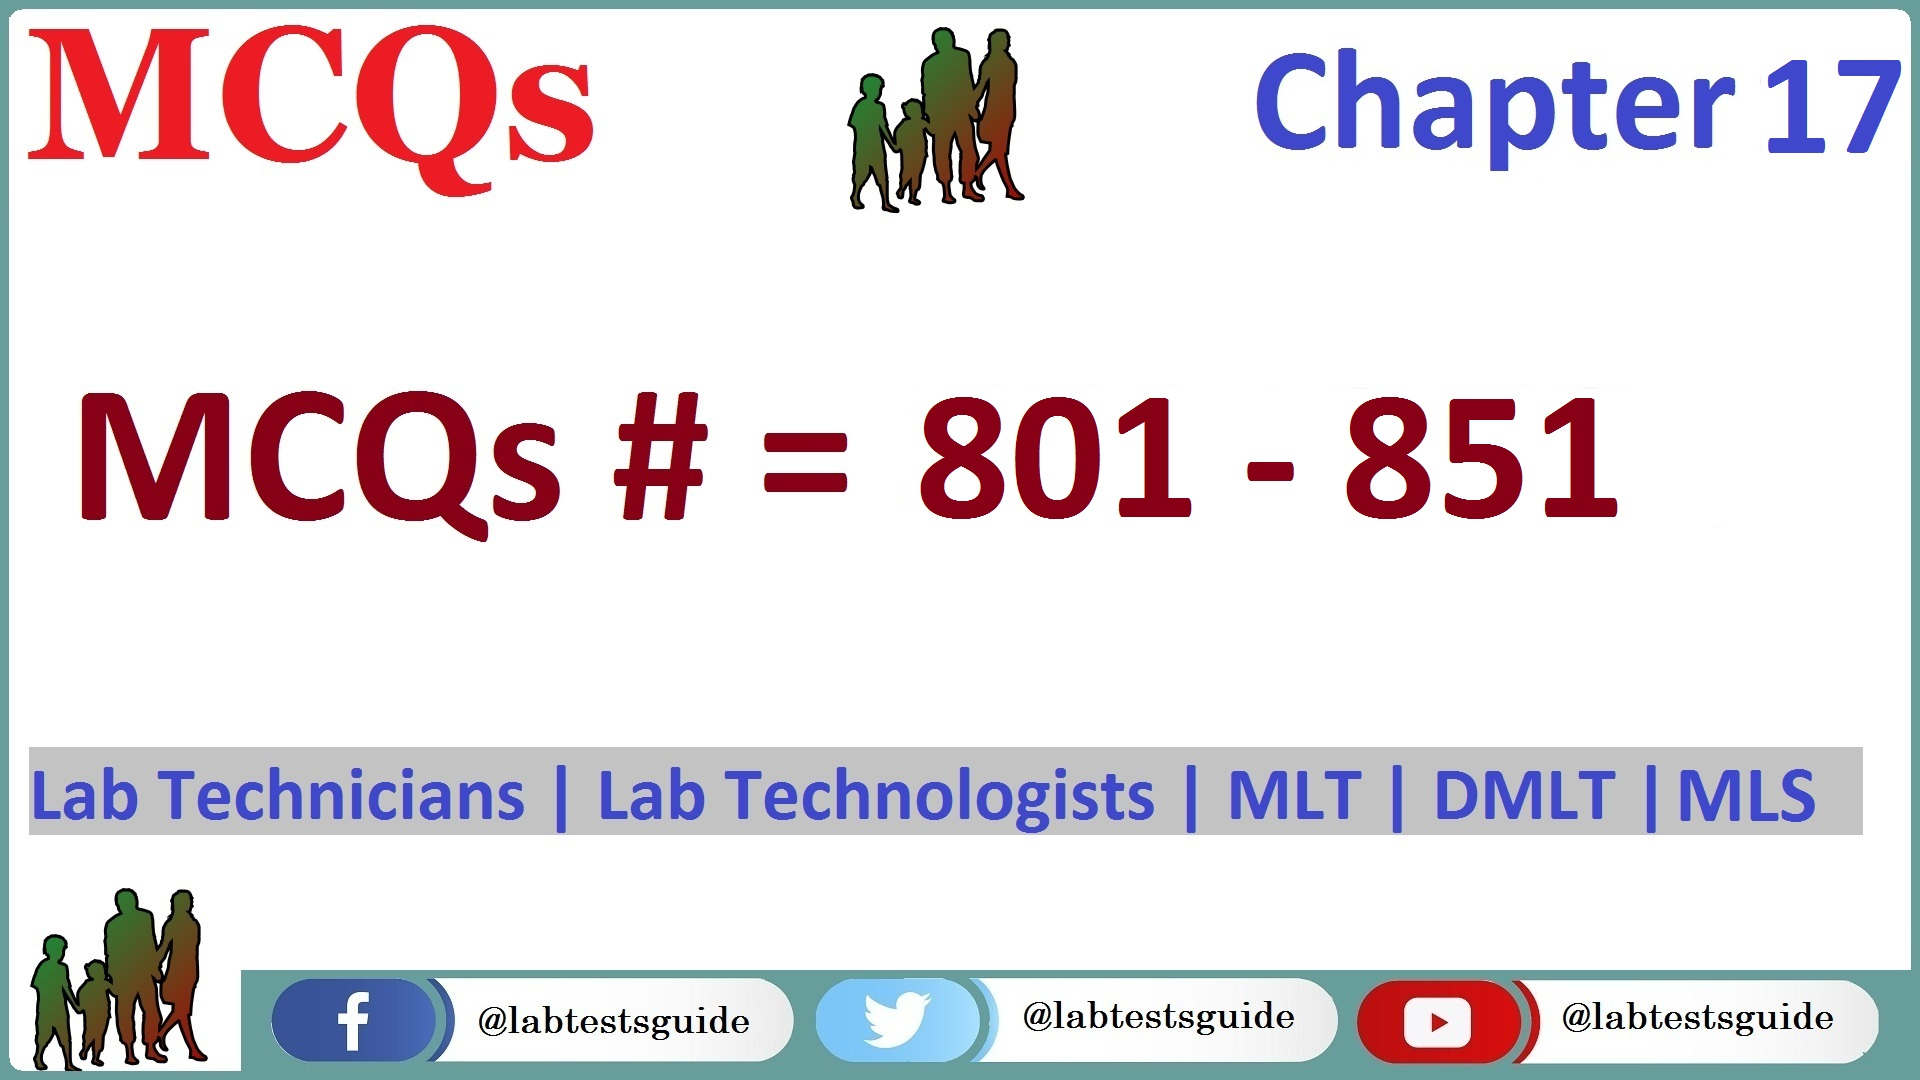 MCQs Chapter 17